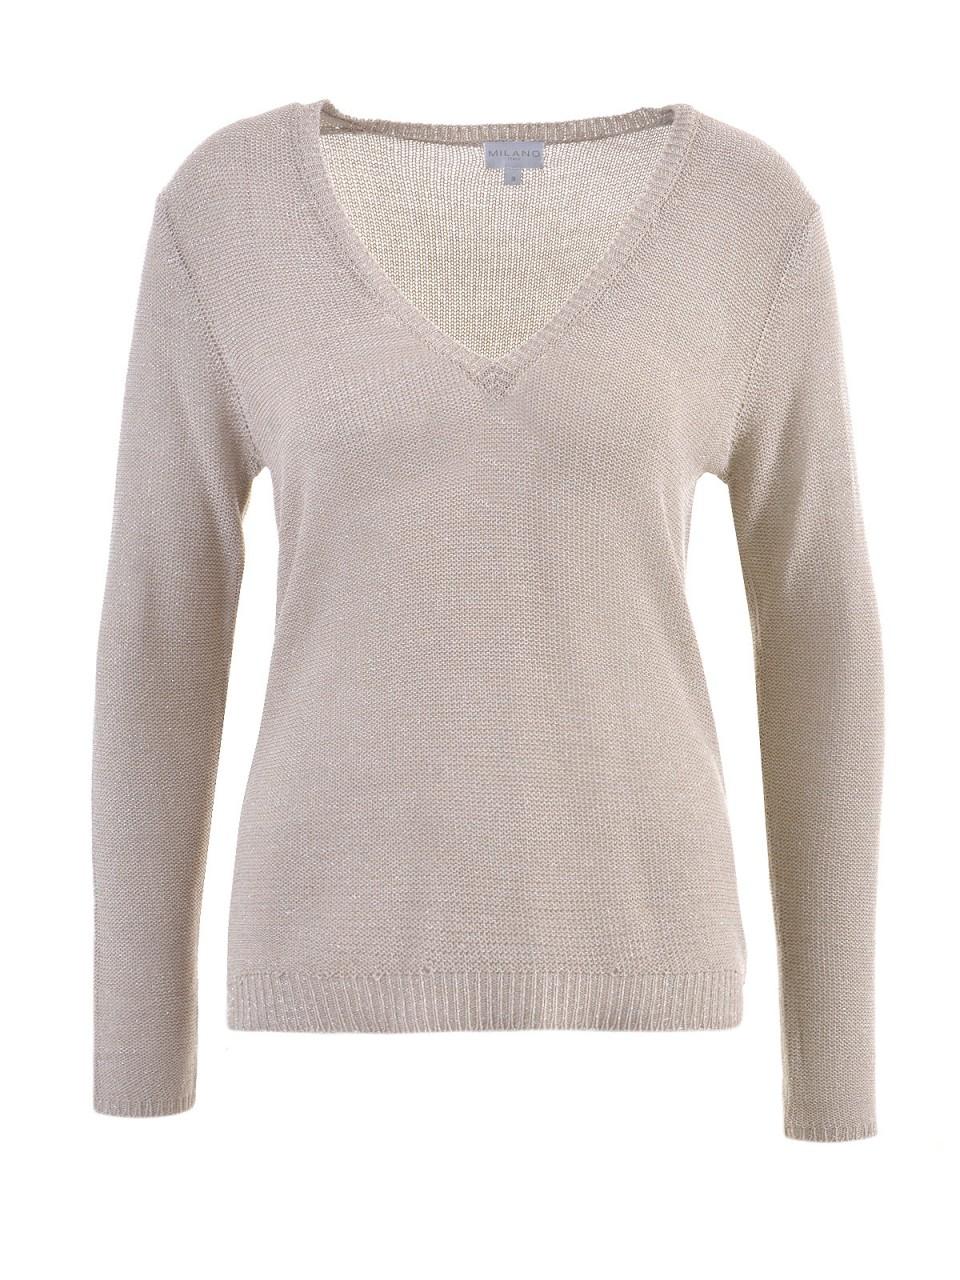 milano-italy-damen-pullover-beige